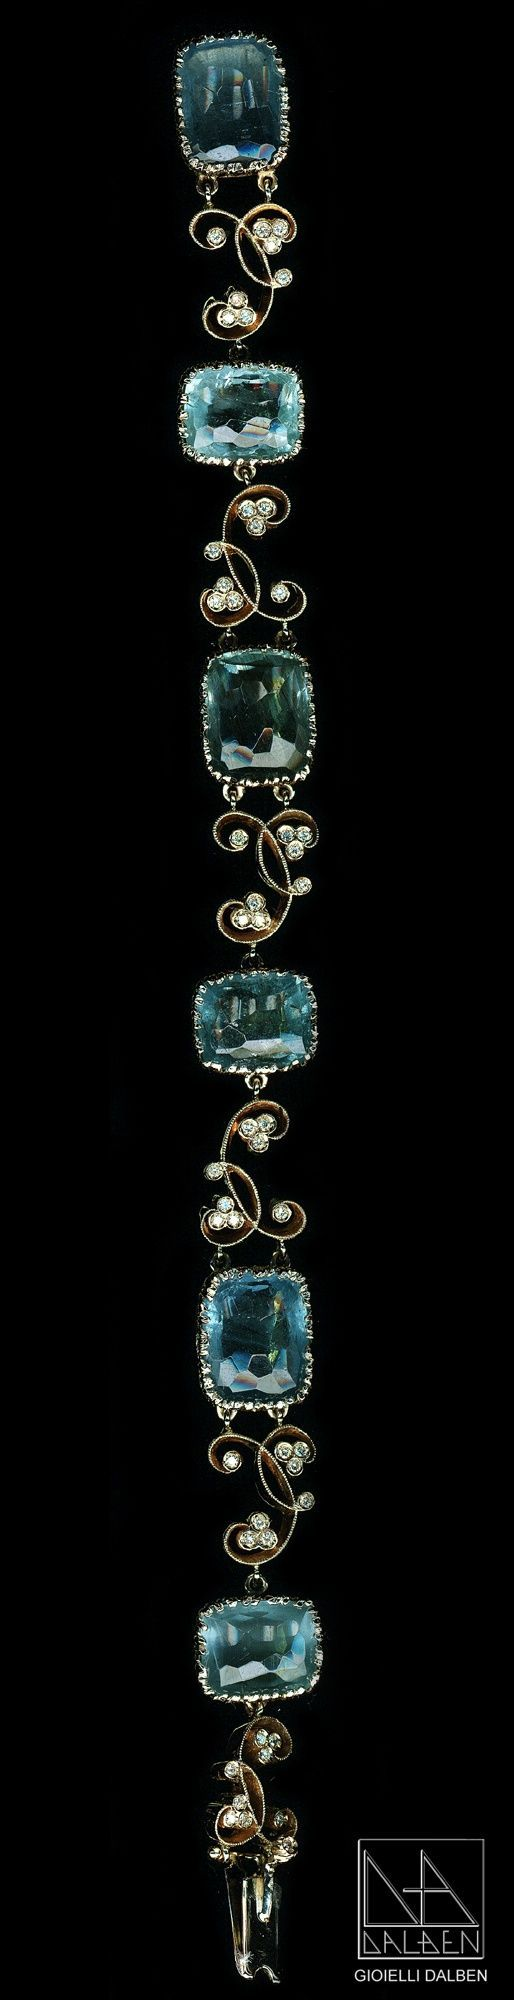 diamonds aquamarine bracelet - gioielli dalben - #jewelry #bracelet #diamonds